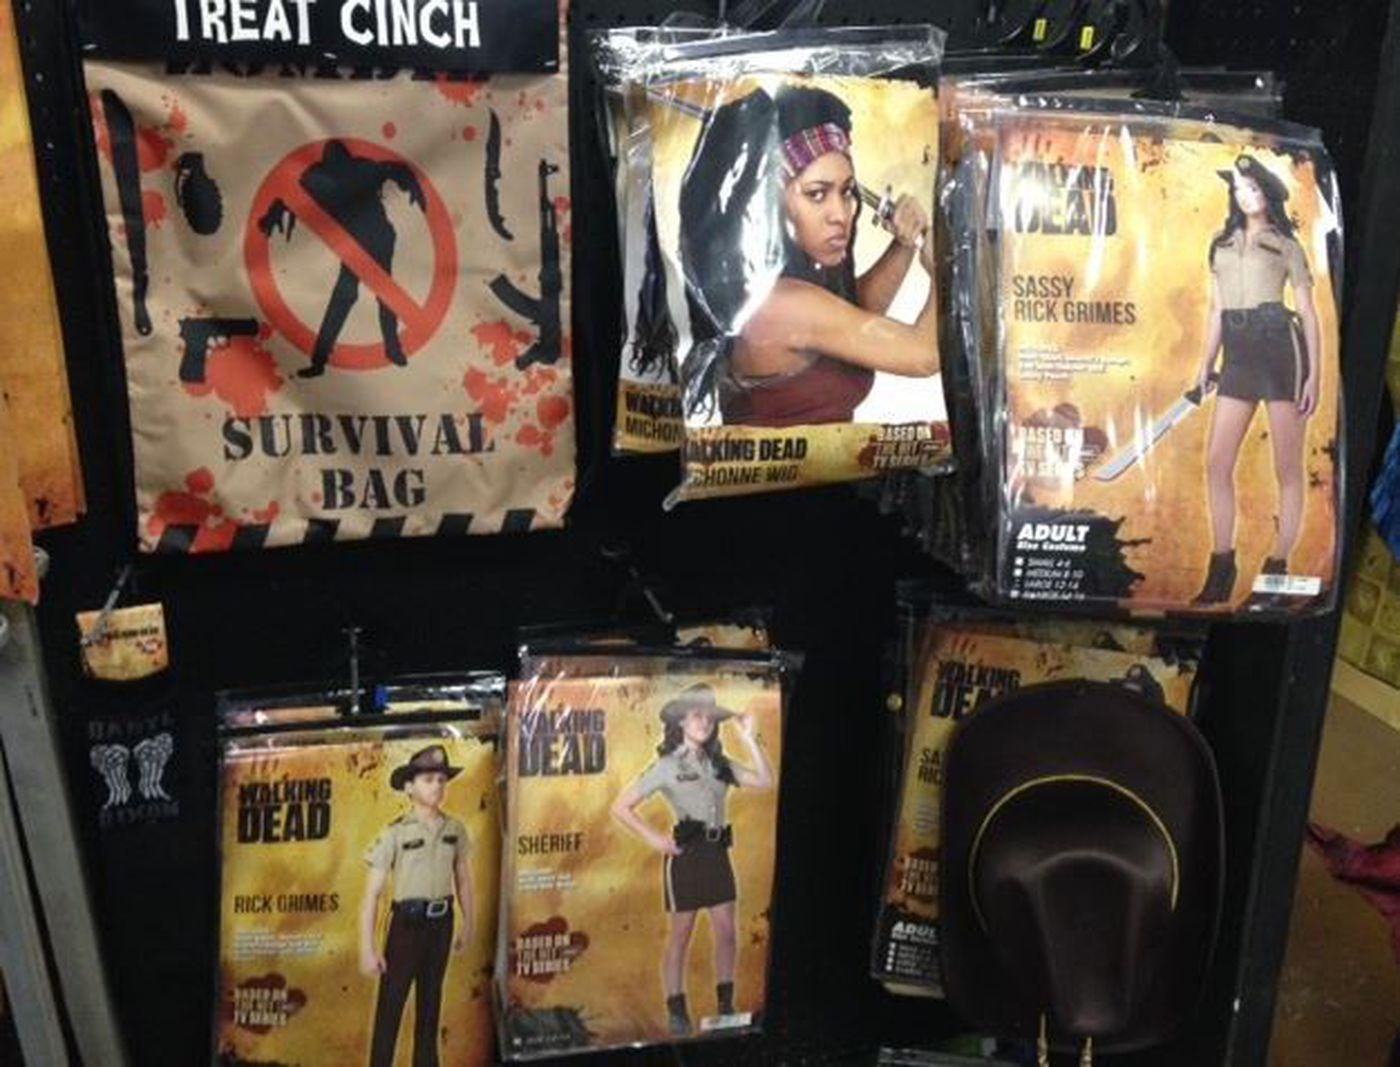 walking dead costumes at spirit halloween store image source wlox news